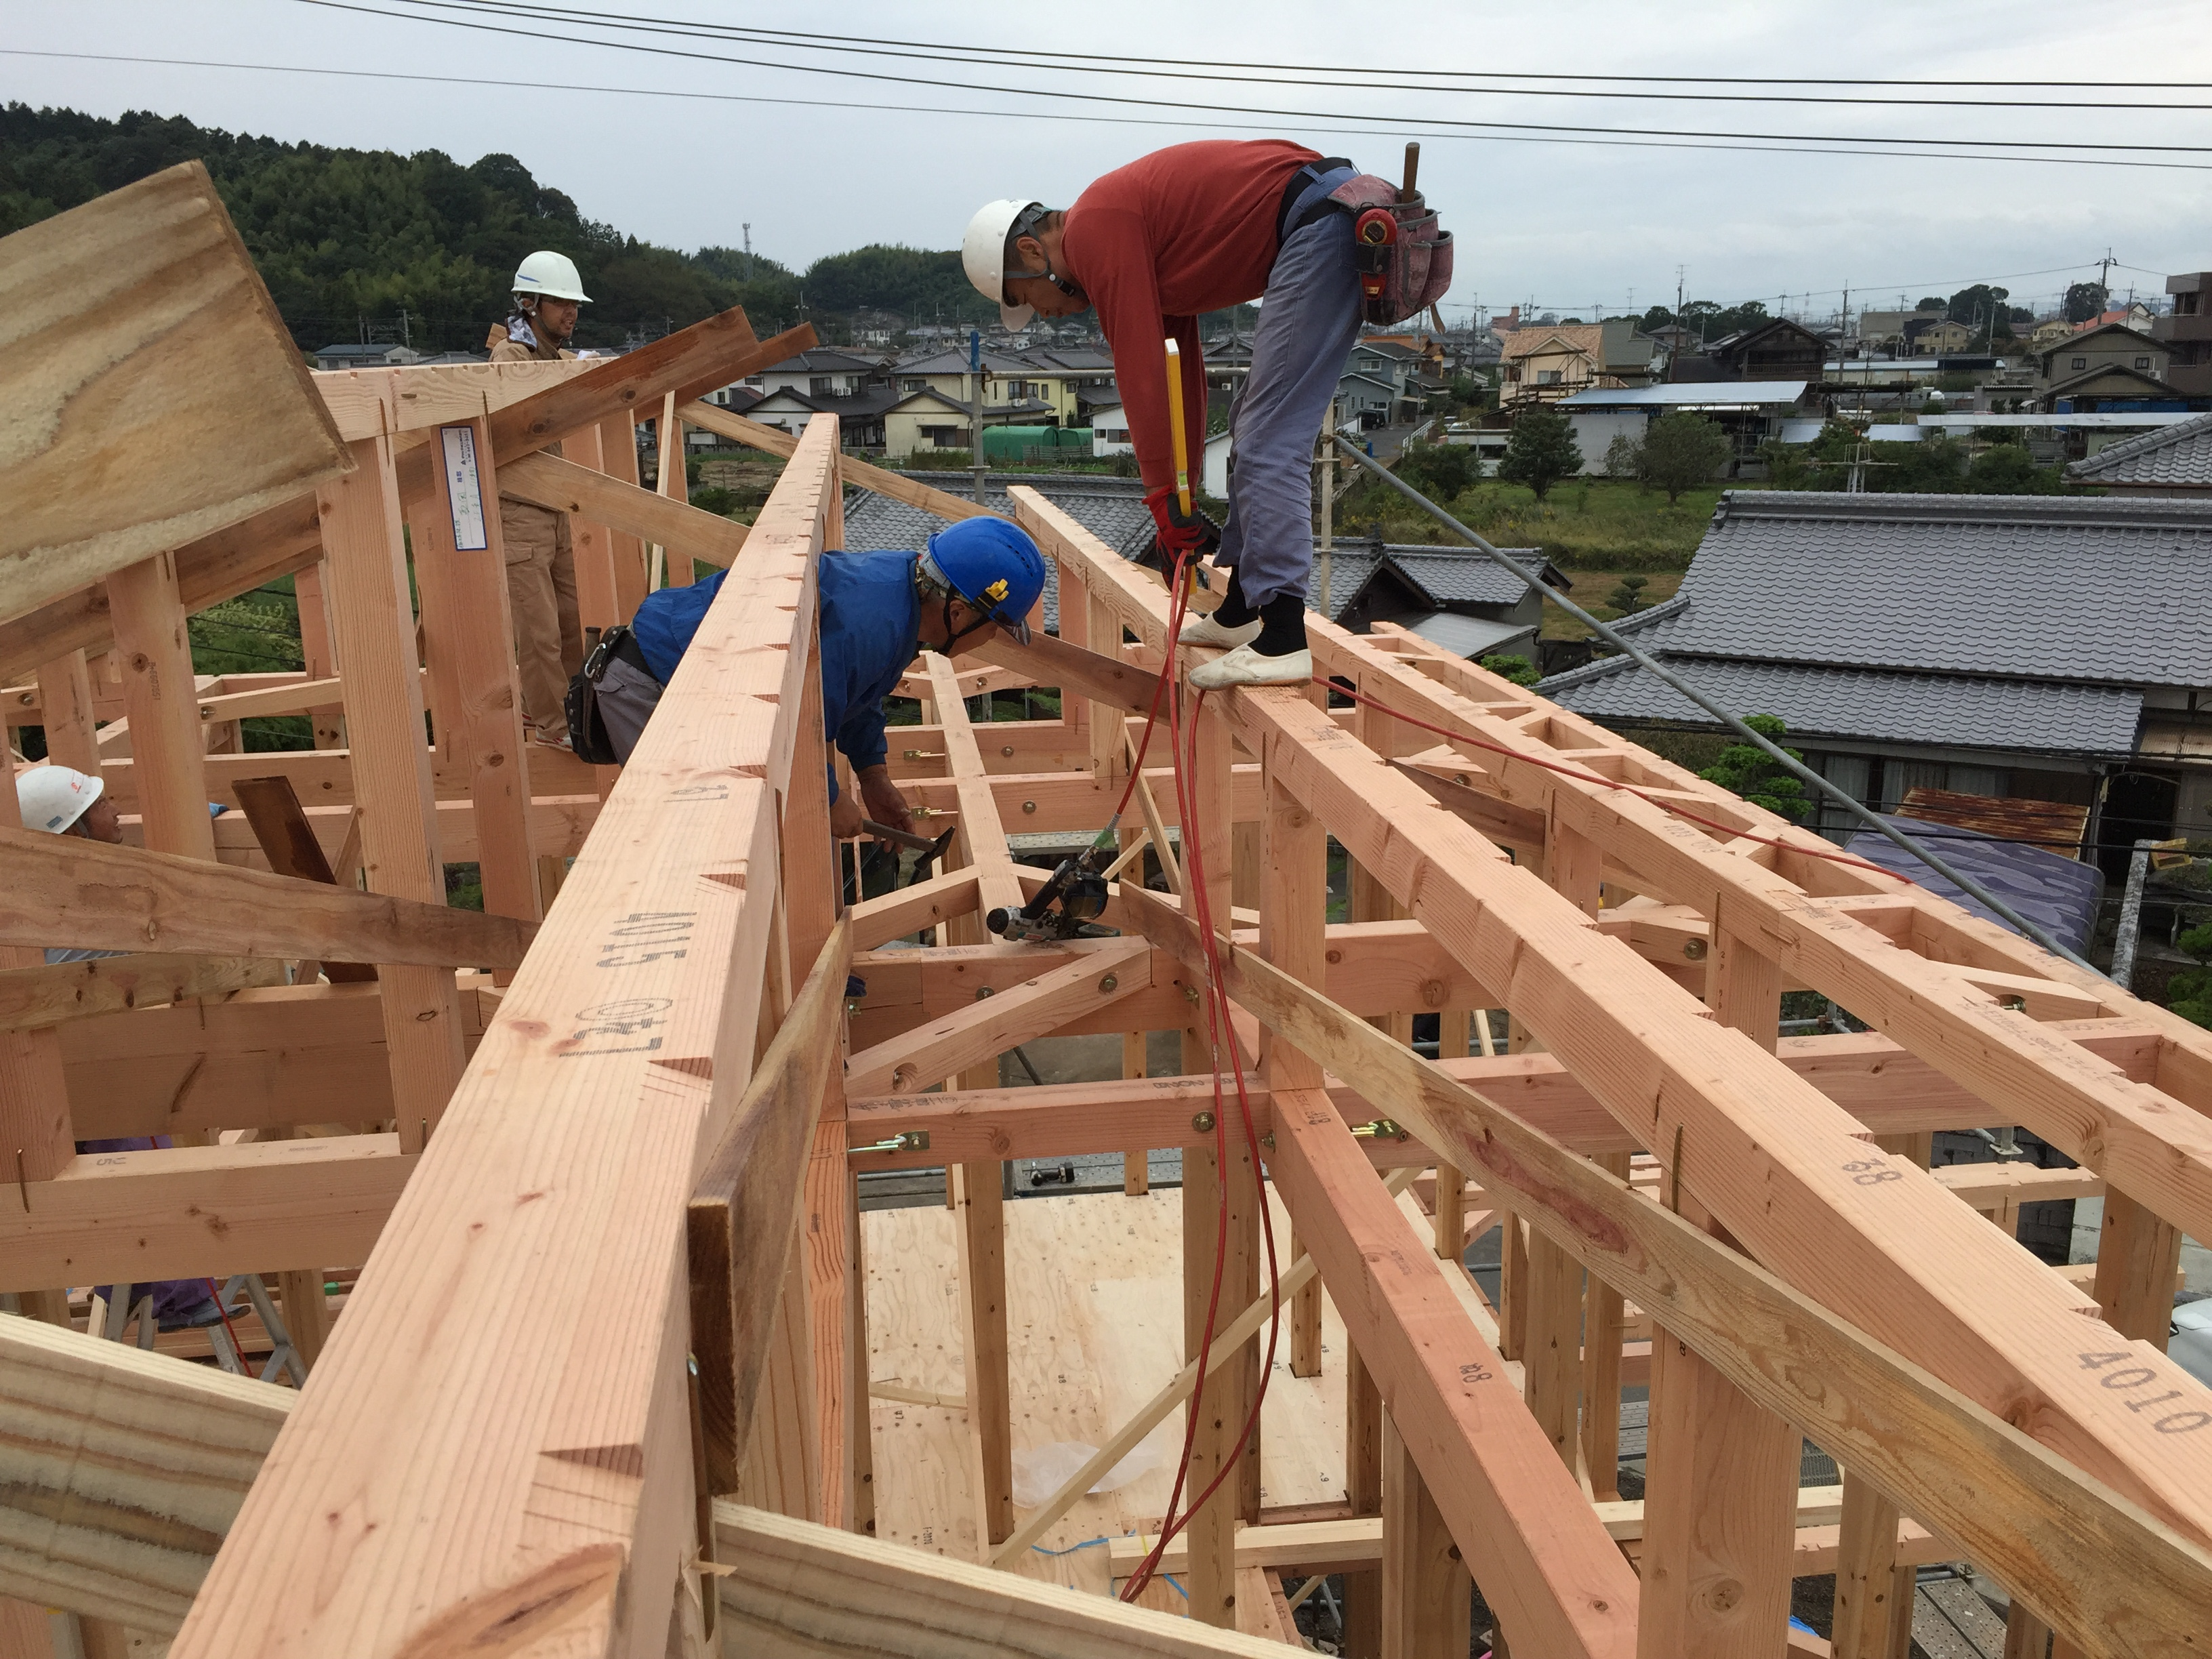 四国中央市で建設会社の建前様子写真